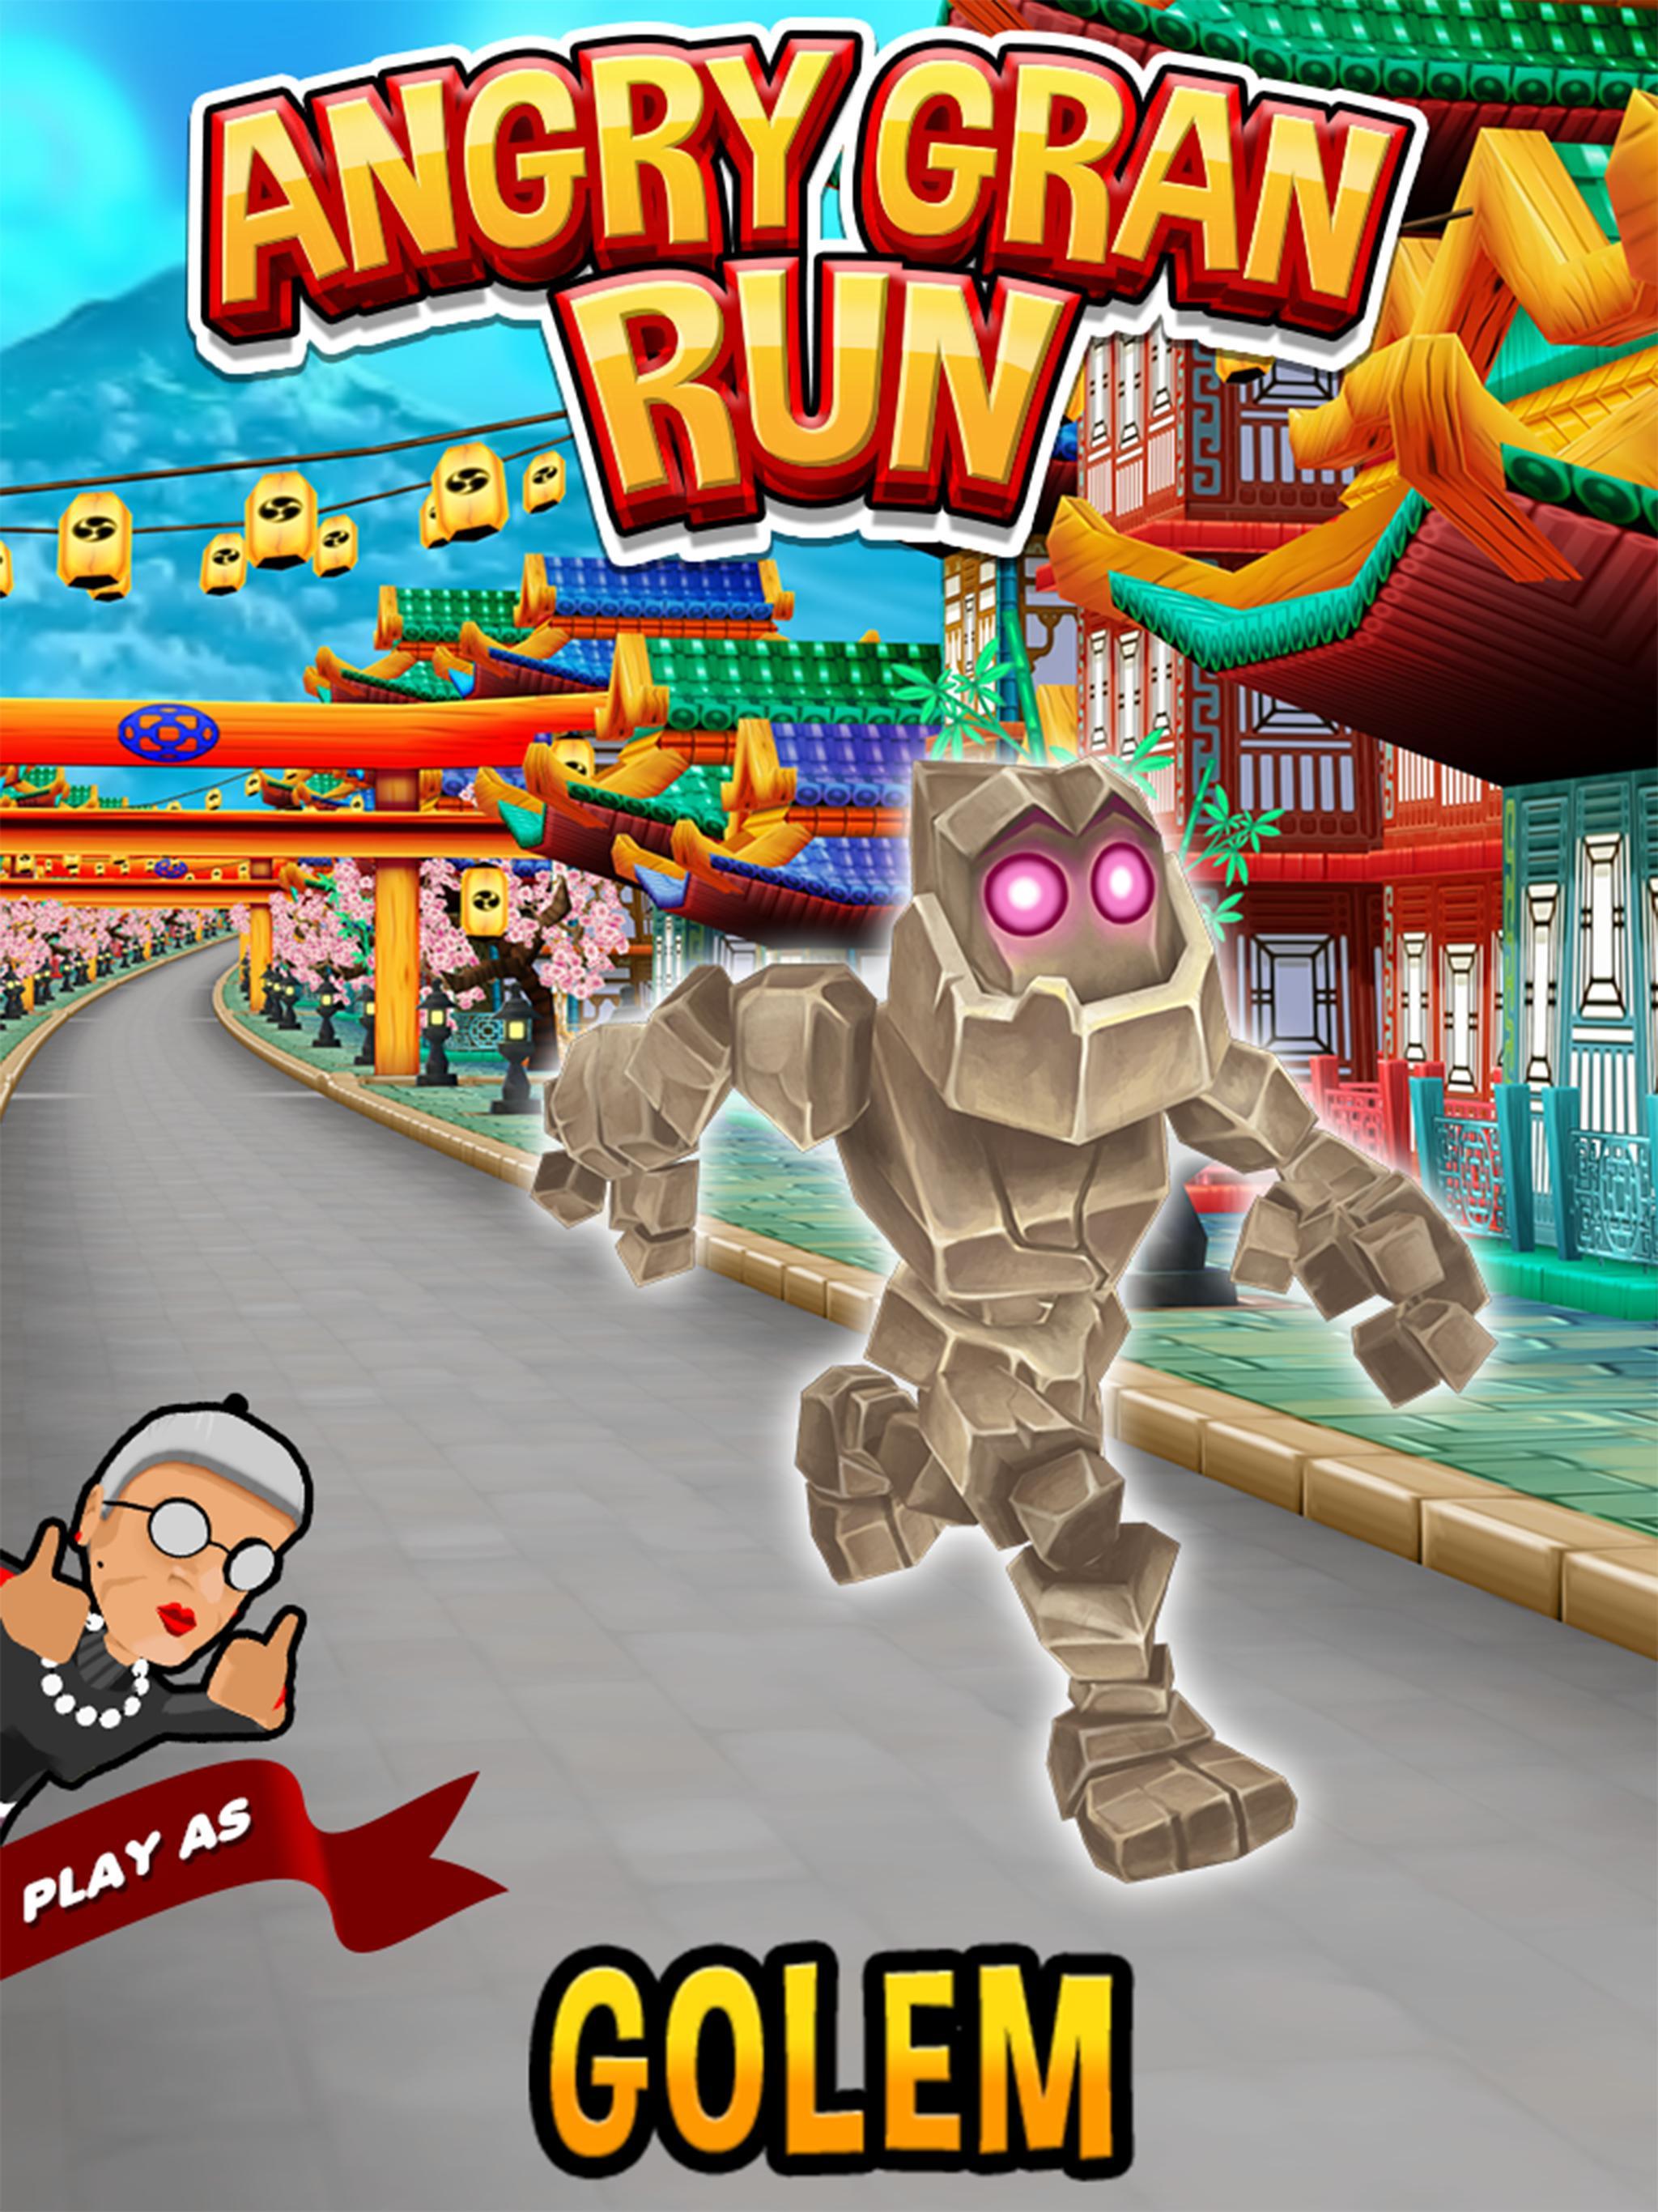 Angry Gran Run Running Game 2.12.1 Screenshot 8